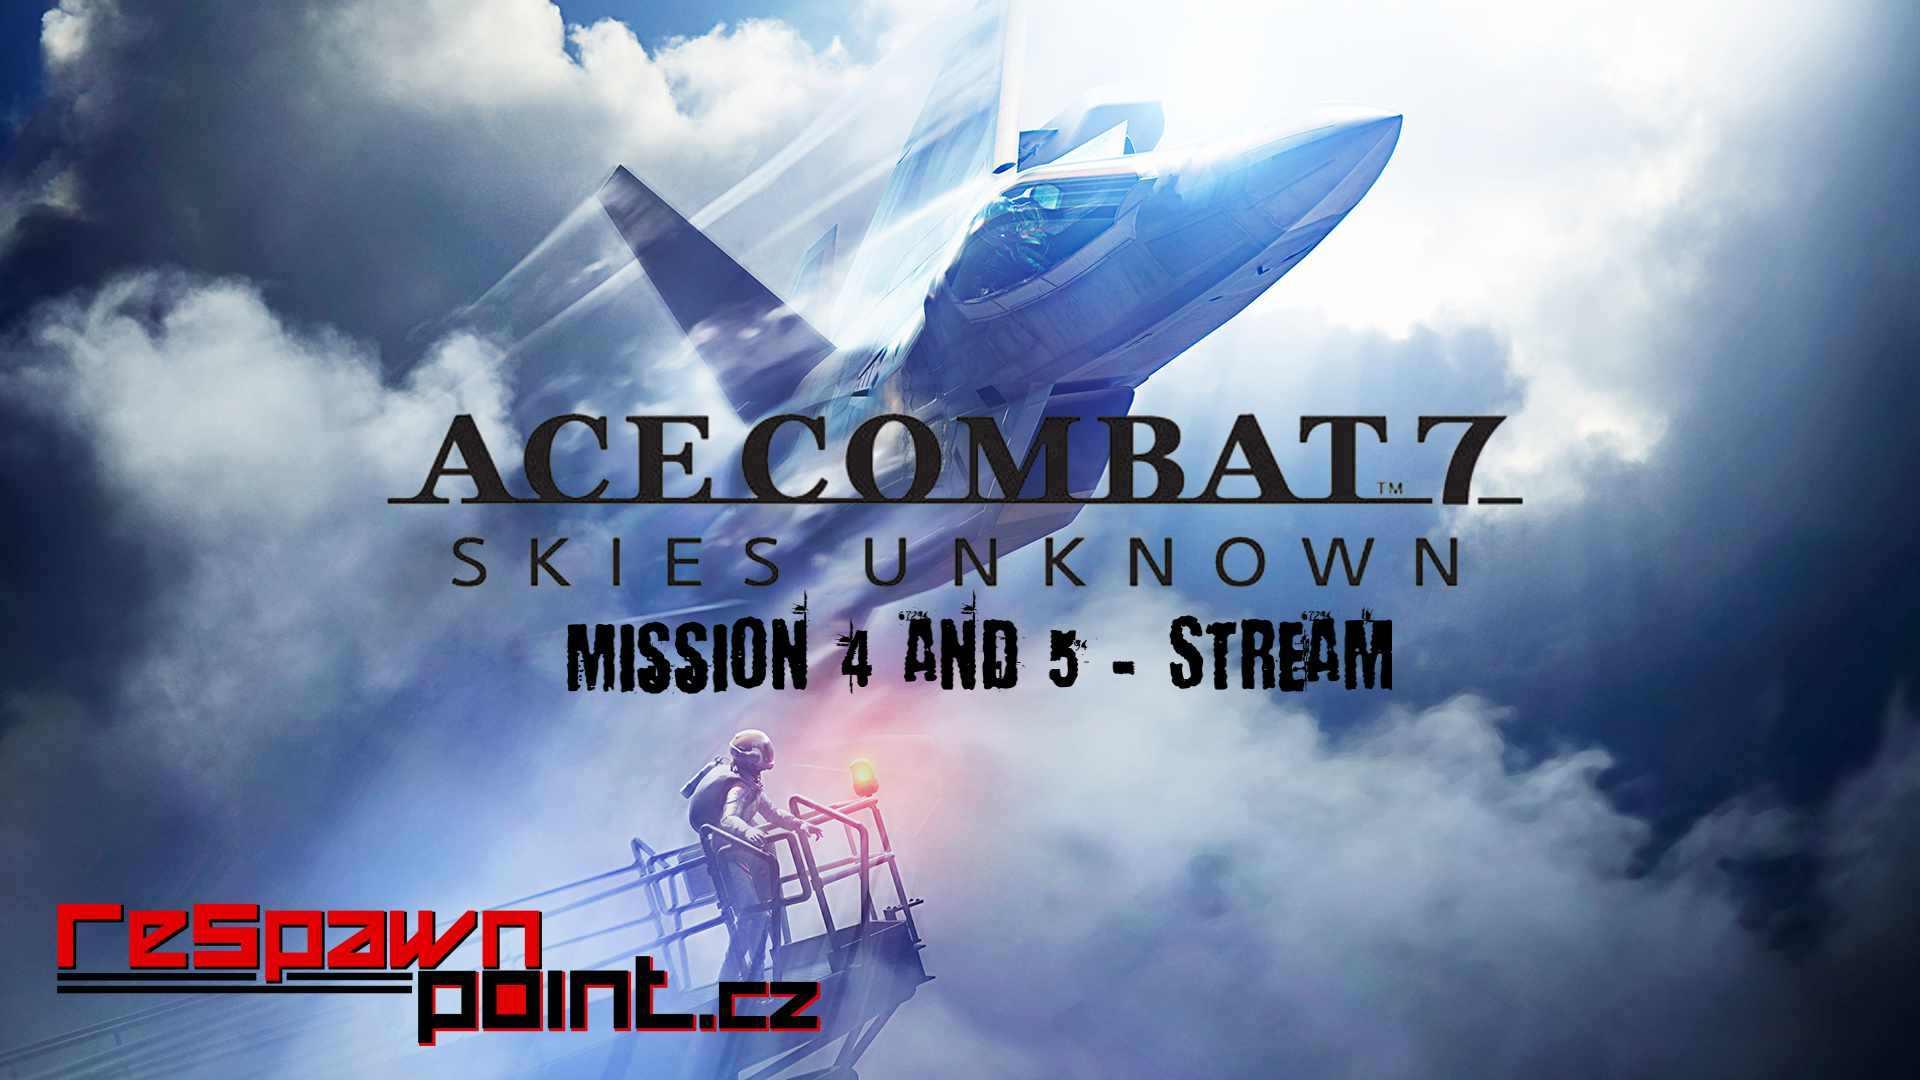 Ace Combat 7 Skies Unknown – Stream CZ (Mission 4 & 5)